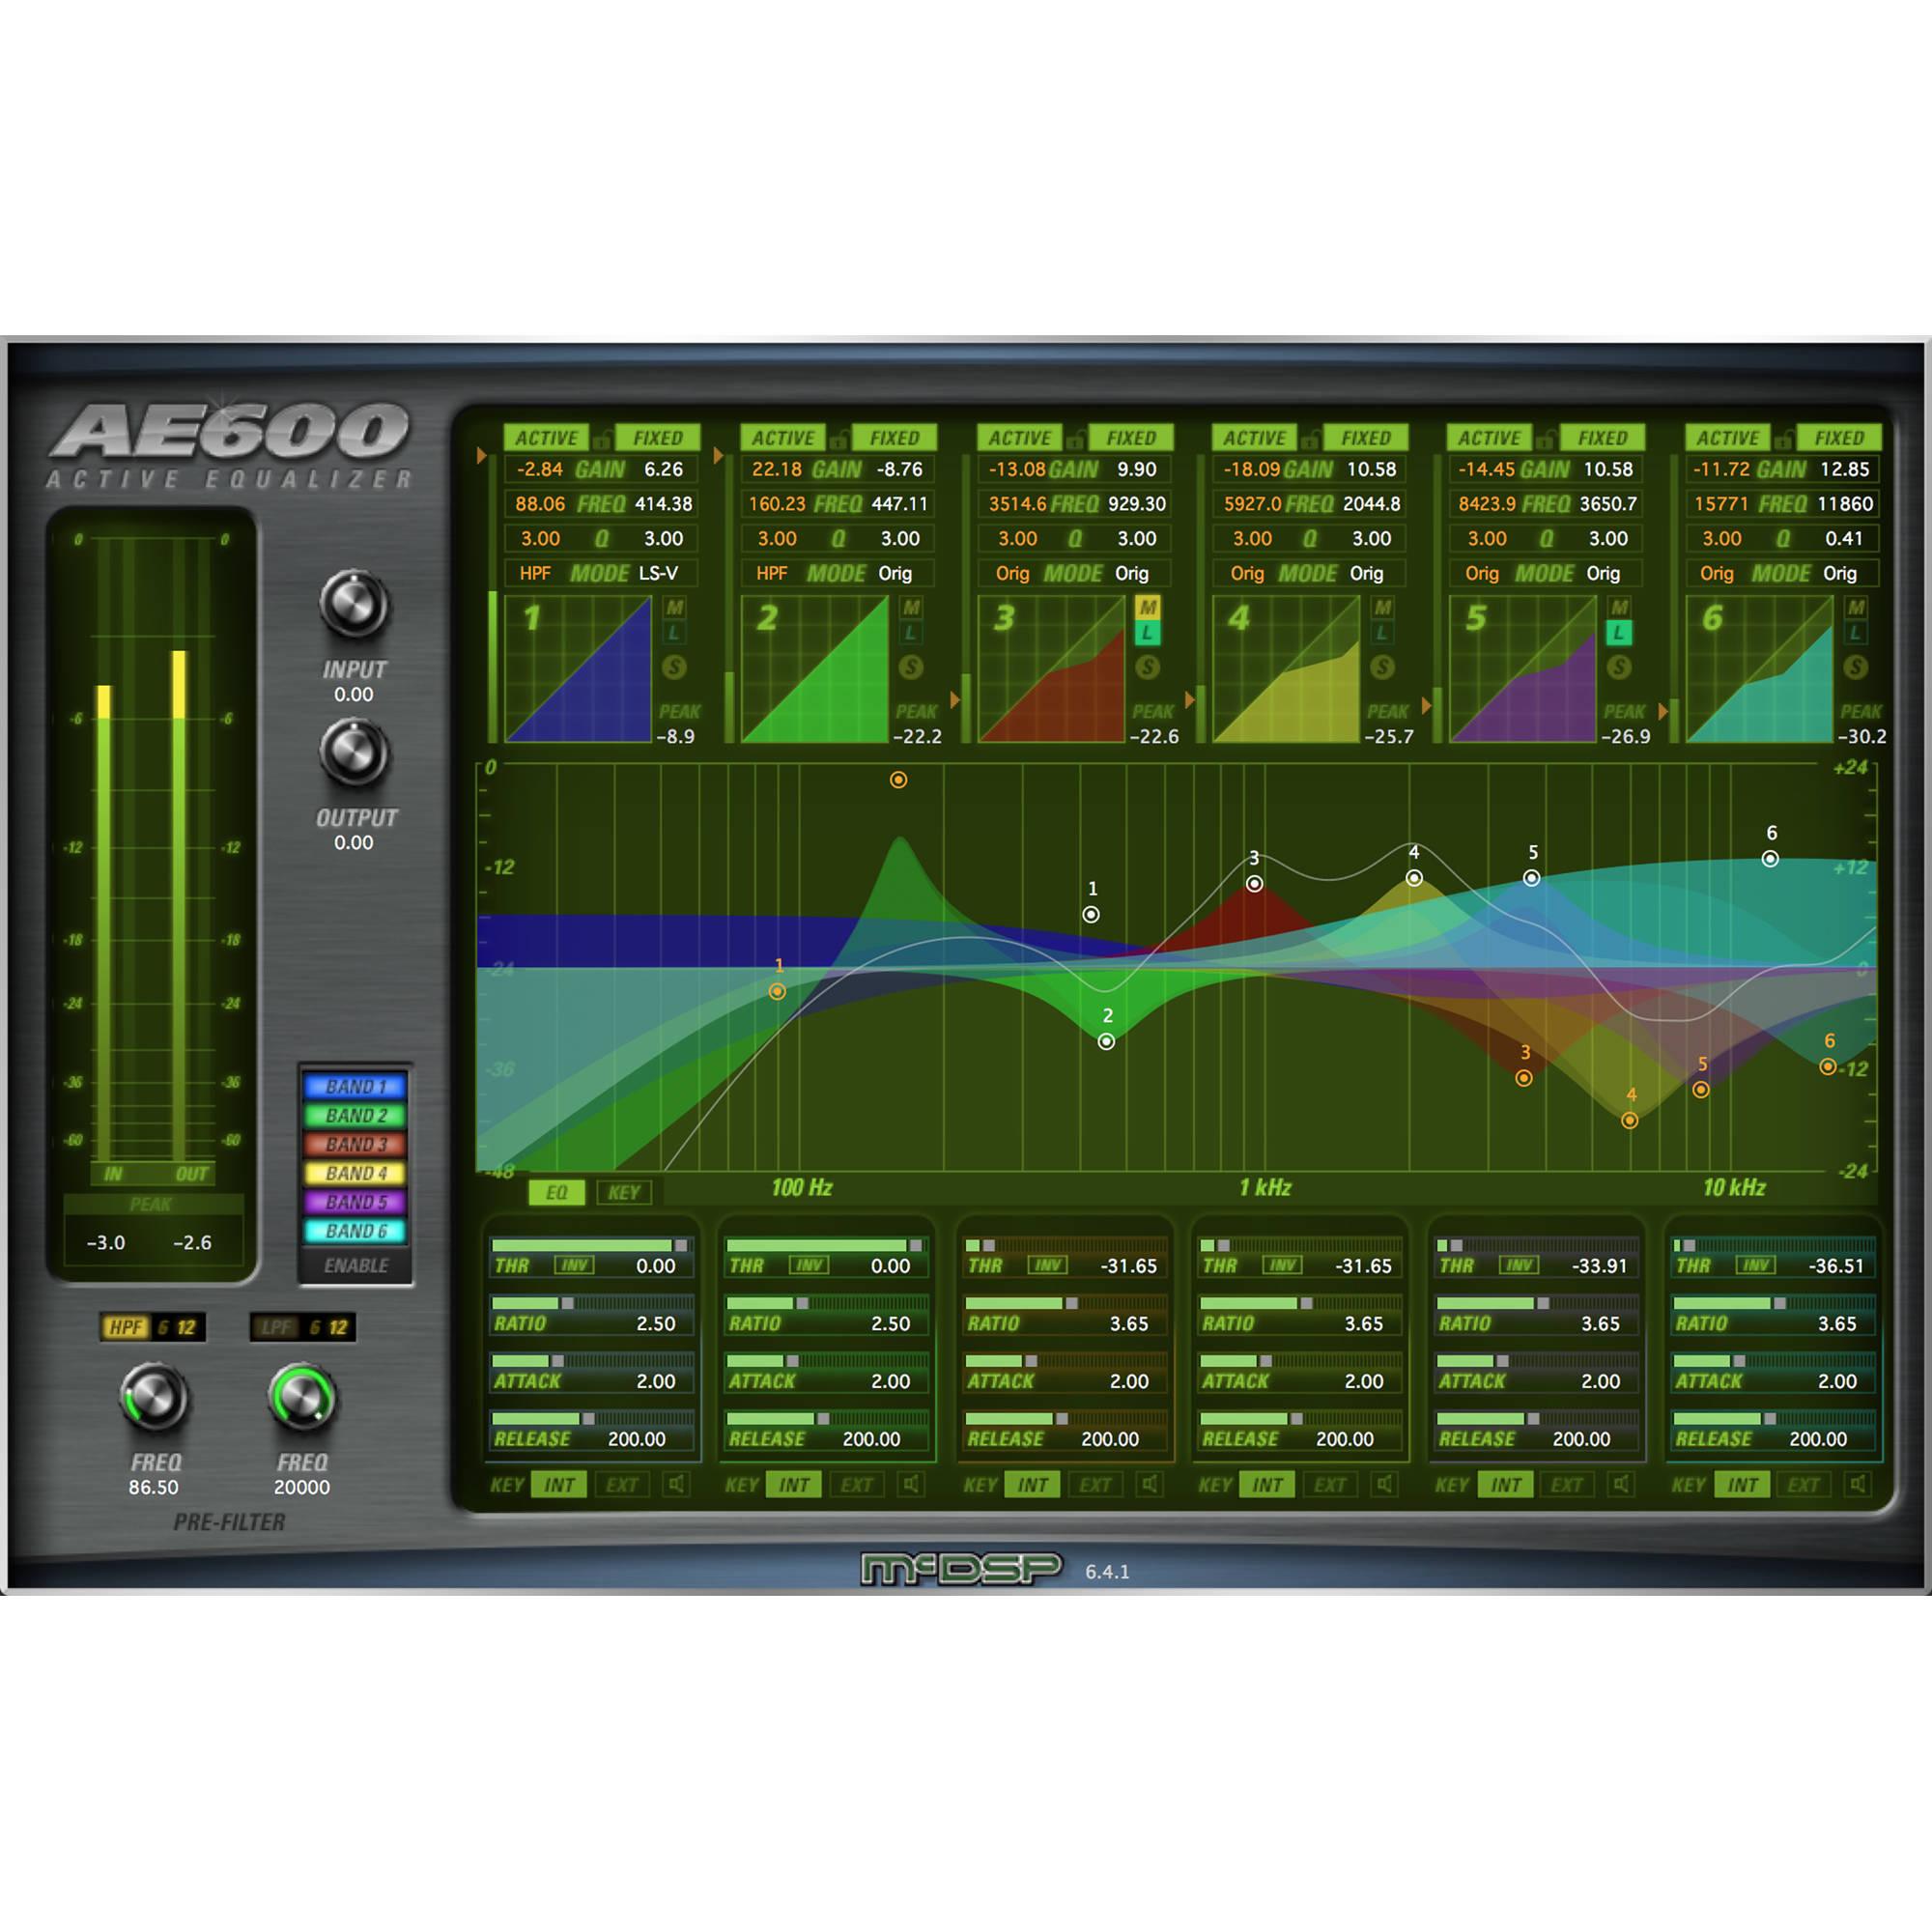 Venom Vx 603d 65 Coaxial Speaker System Daftar Harga Terkini Diablo 603 Dw Mcdsp M Pi Ax Ae600 Active Eq V6 1293558